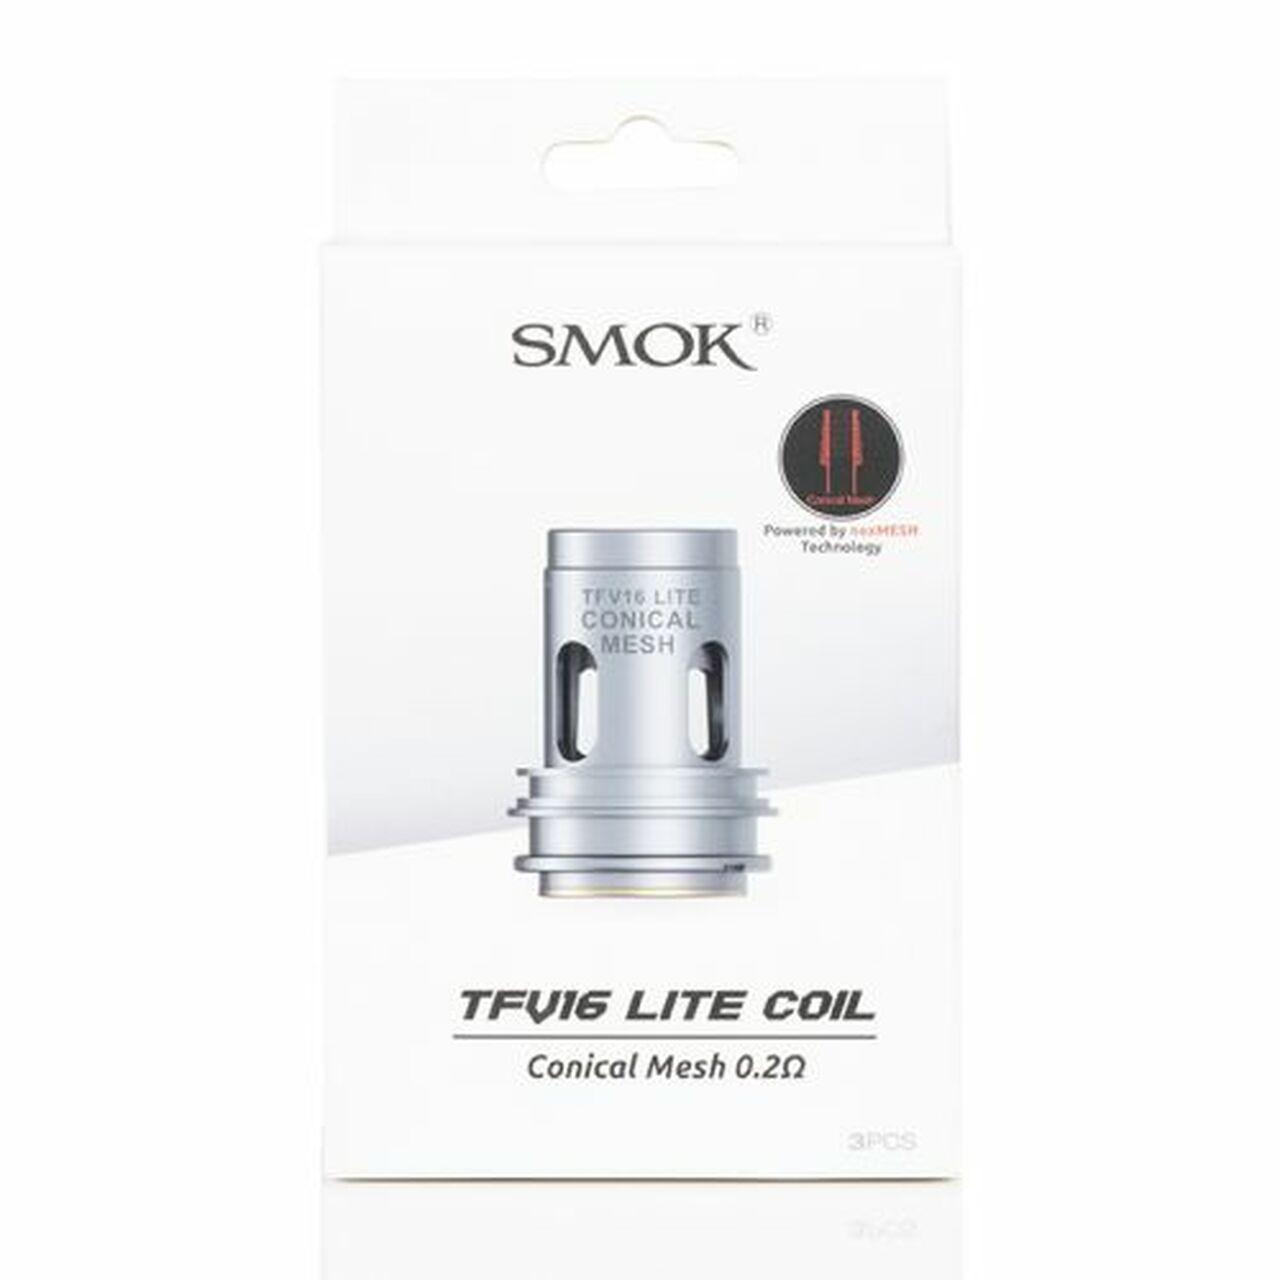 TFV16 Lite Coils